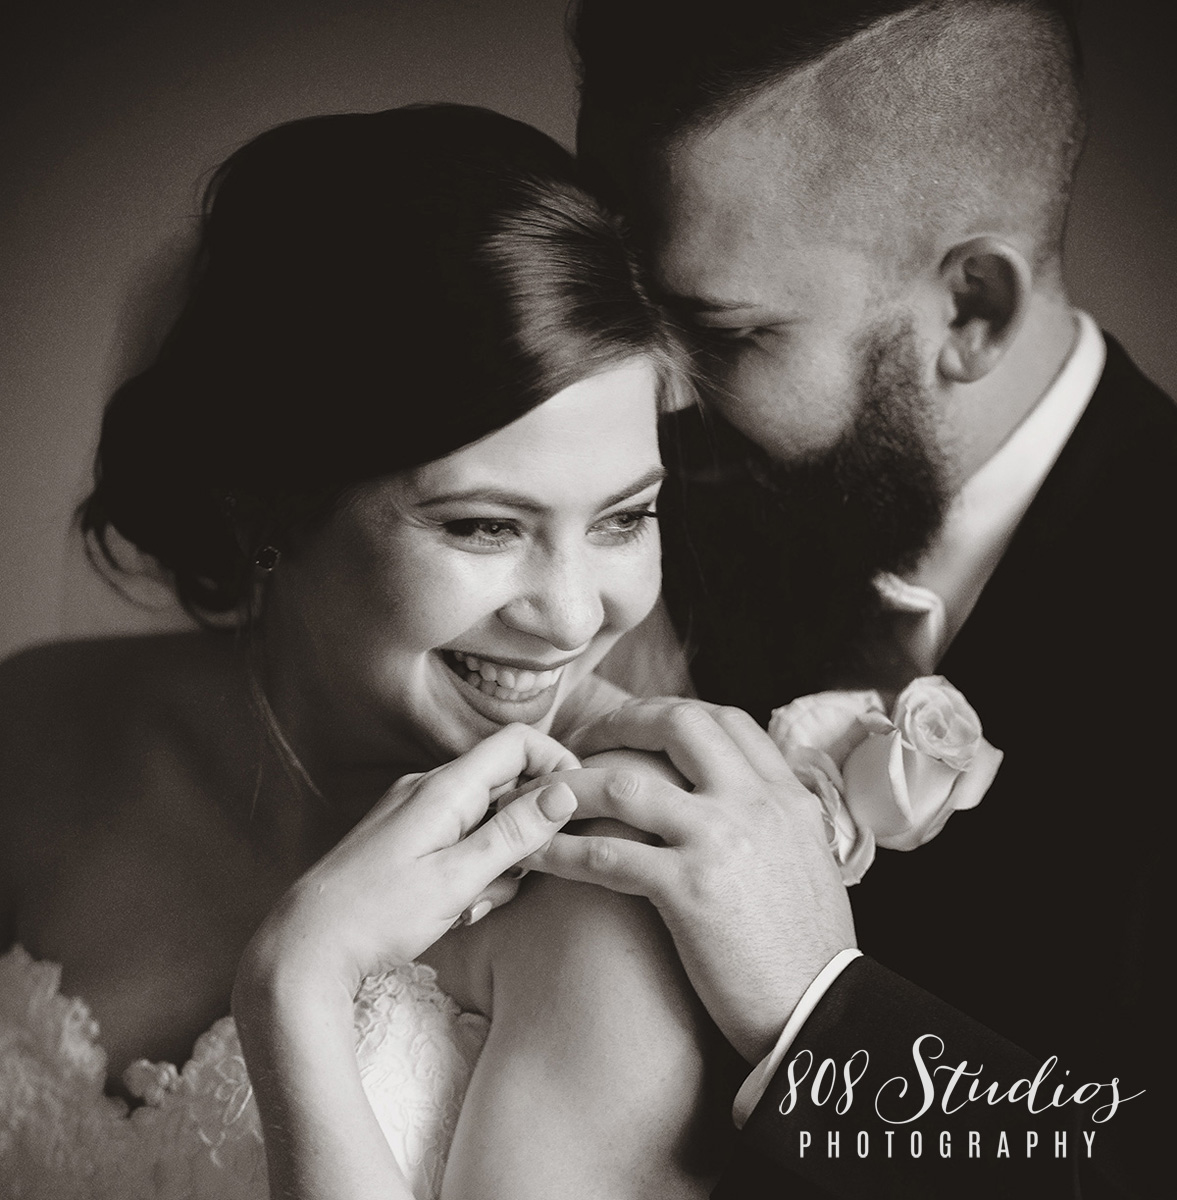 808 STUDIOS Dayton Wedding Photographer photography ohio 543_7756